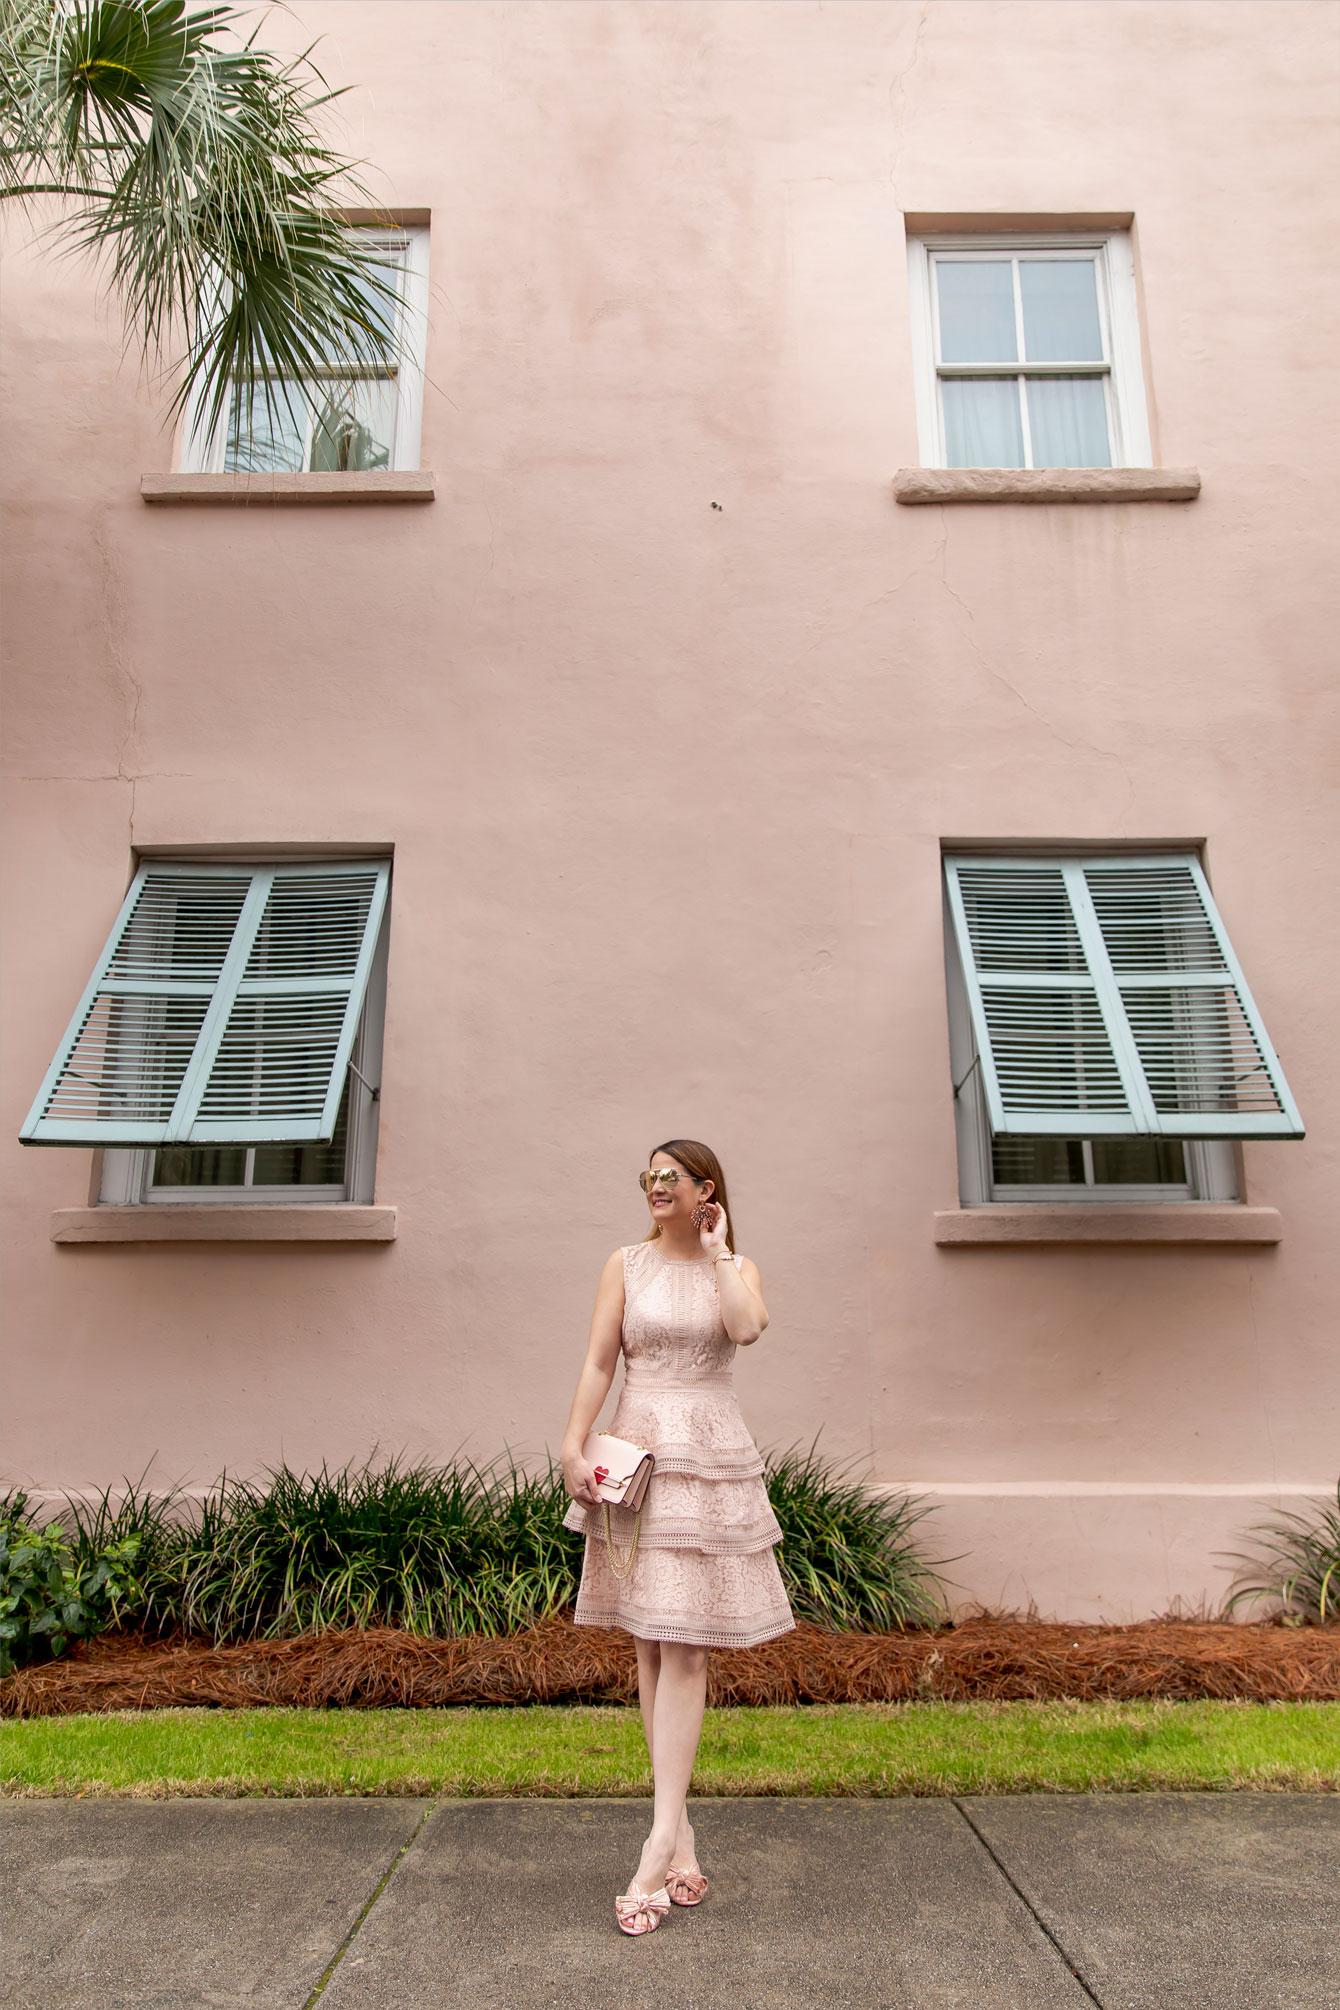 Charleston Pink Hotel